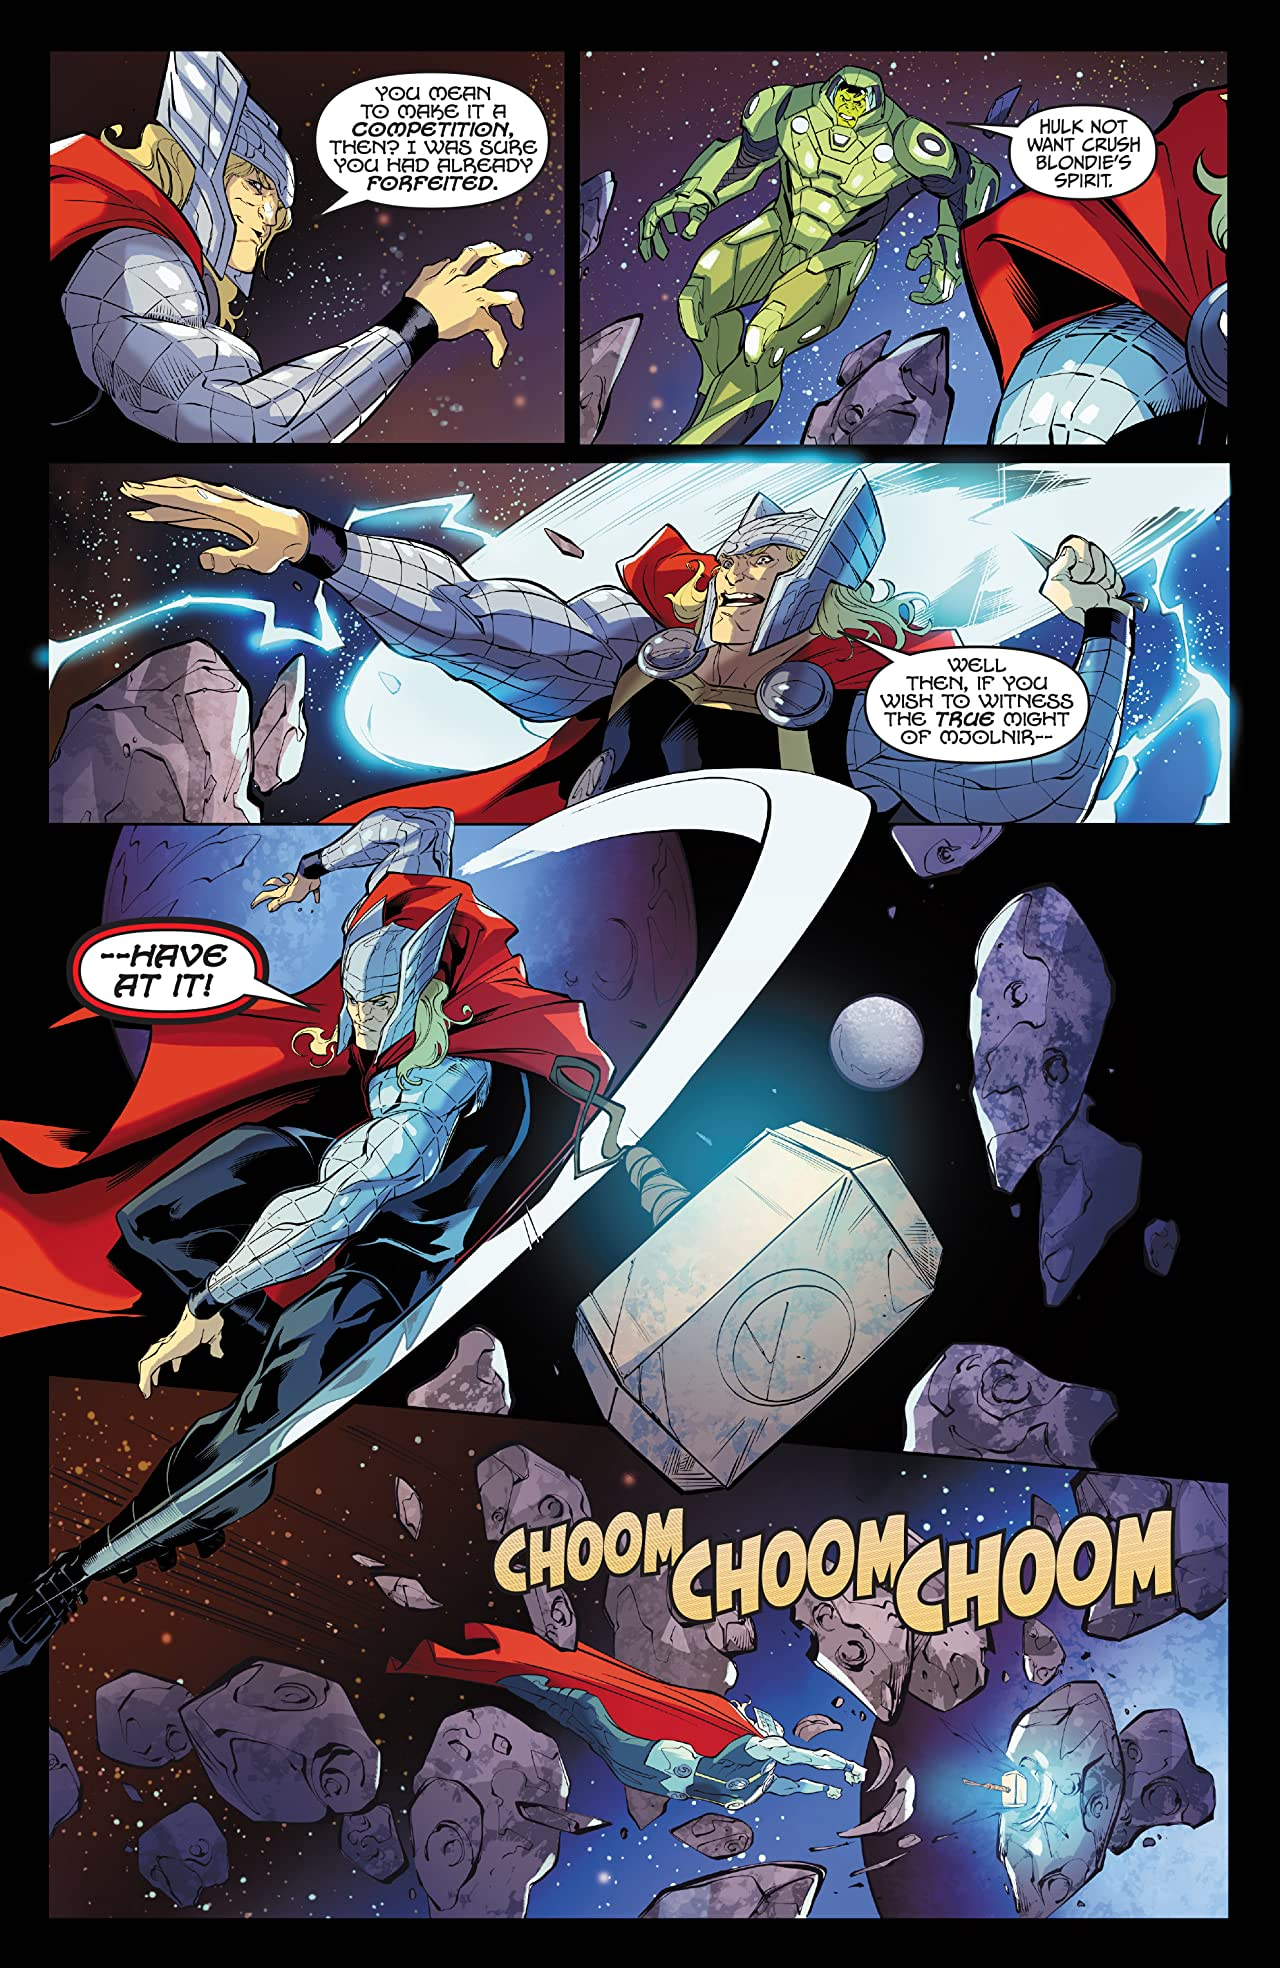 thor vs hulk champions of the universe 2017 1 of 6 comics